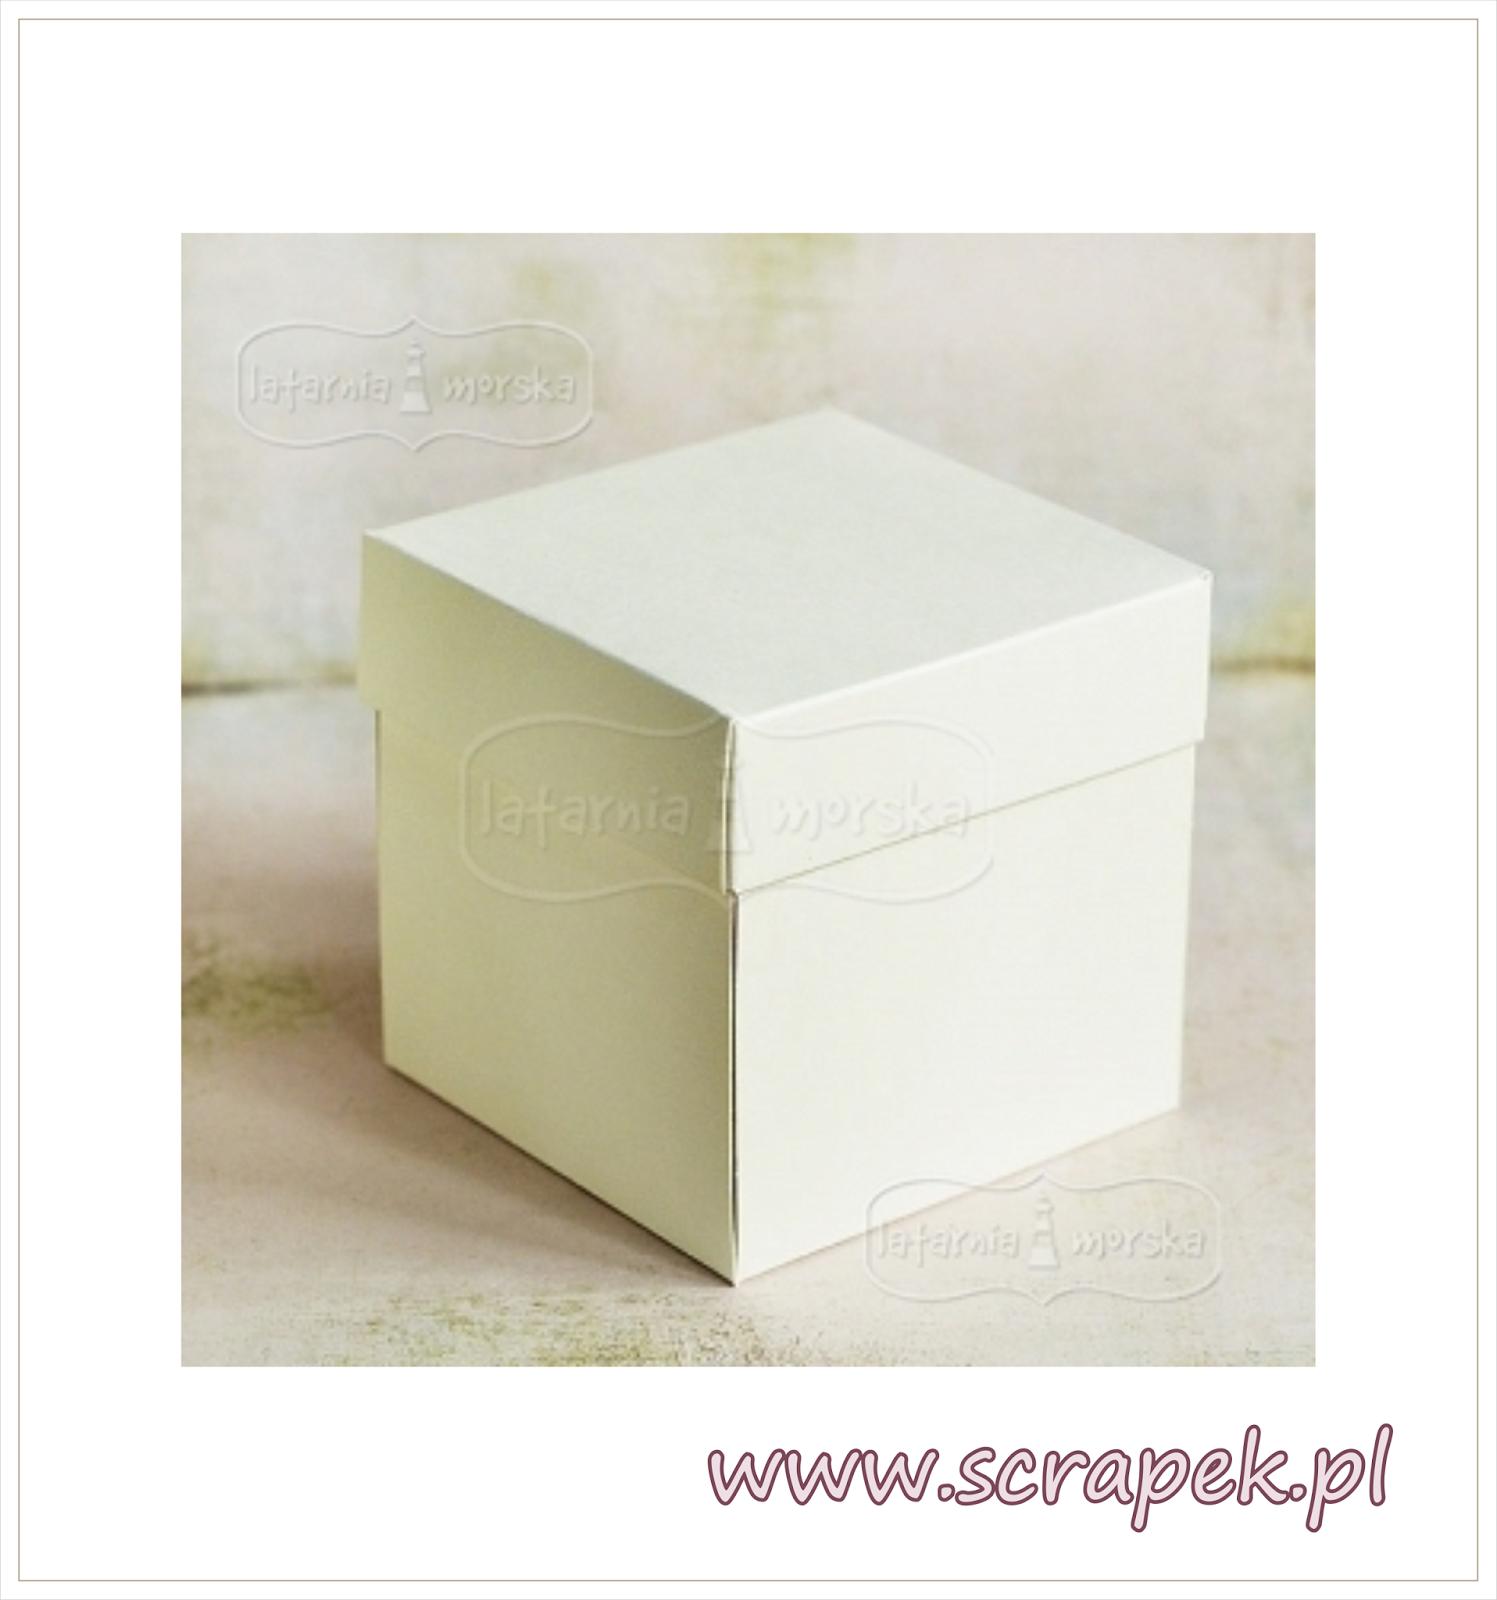 http://www.scrapek.pl/pl/p/Exploding-Box-kremowy/10479